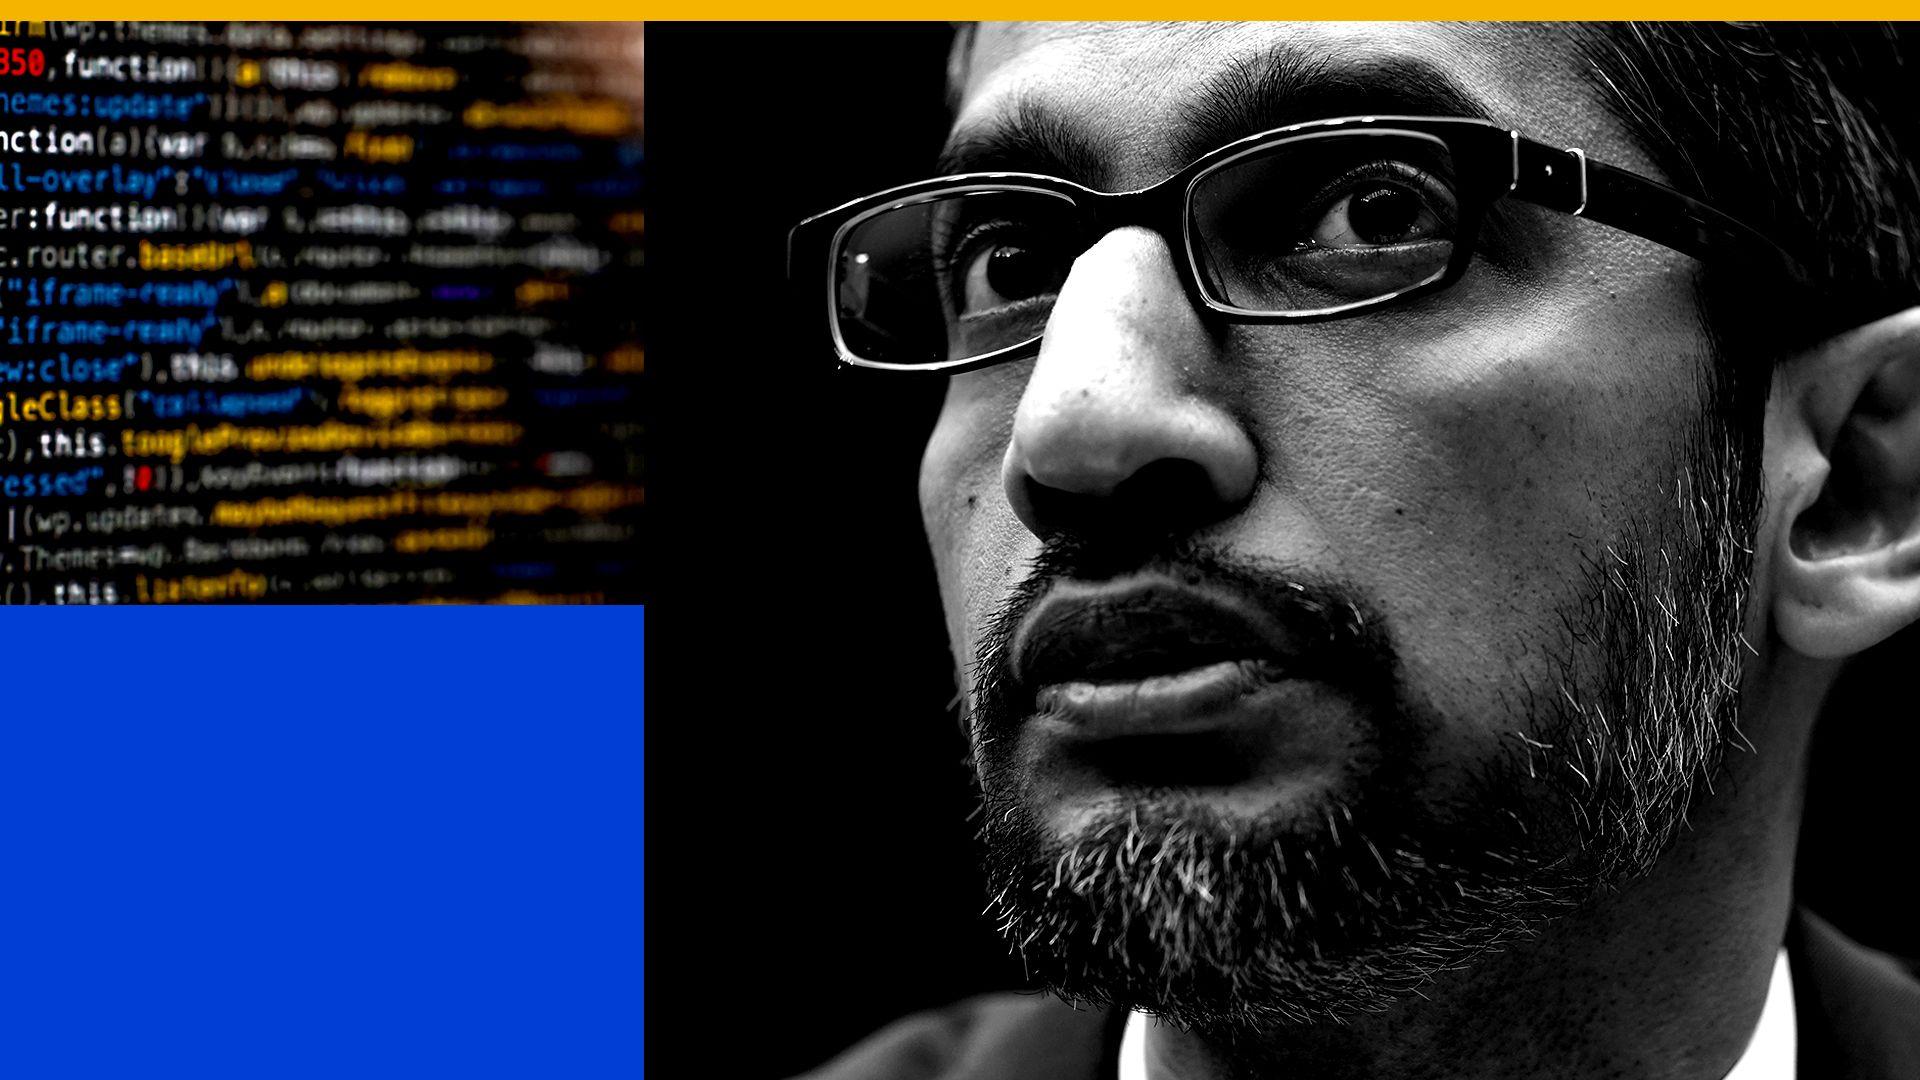 Illustration of Google CEO Sundar Pichai